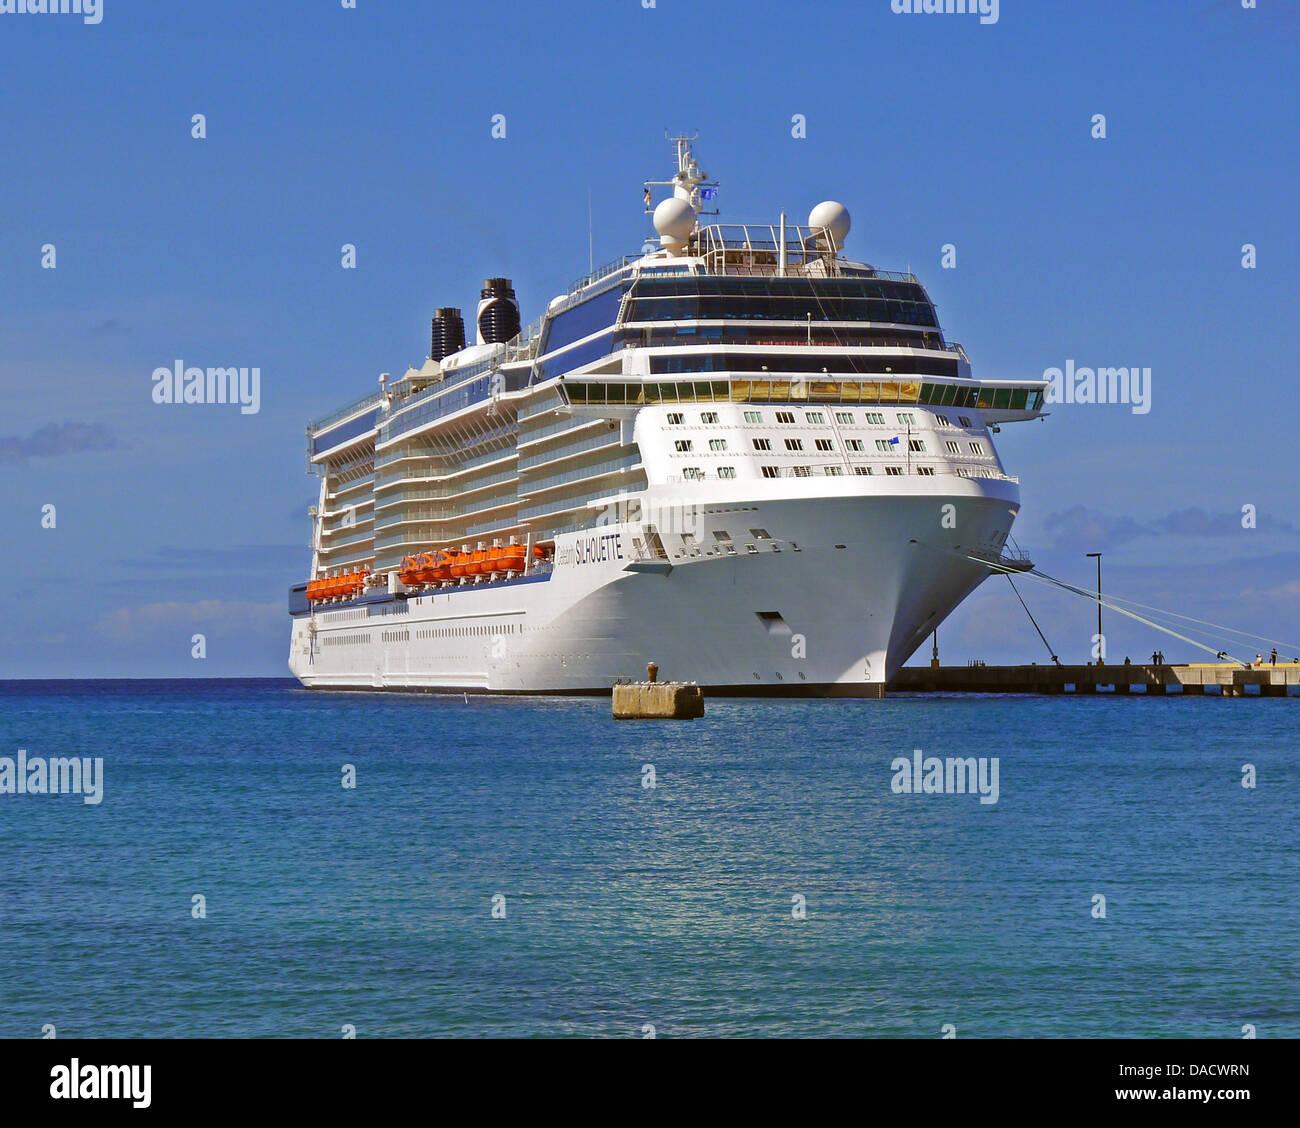 Celebrity Silhouette Tour & Review: Solstice Class ...